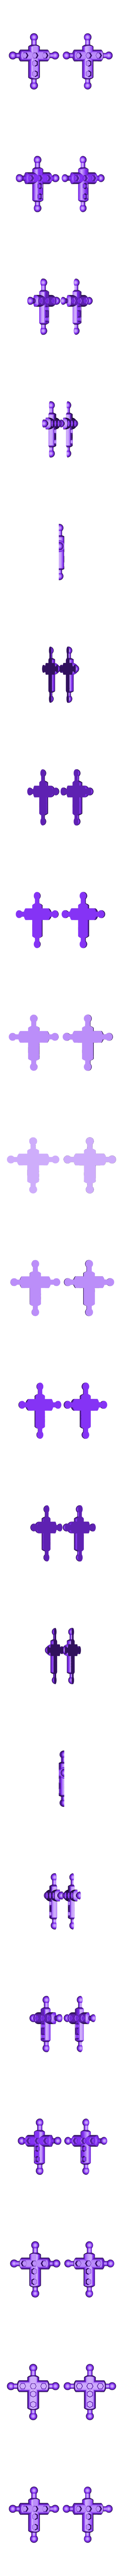 "modibot-remix-torso-upper-halves.stl Download free STL file Modibot action figure ""easy print"" remix • 3D printer design, firebird"